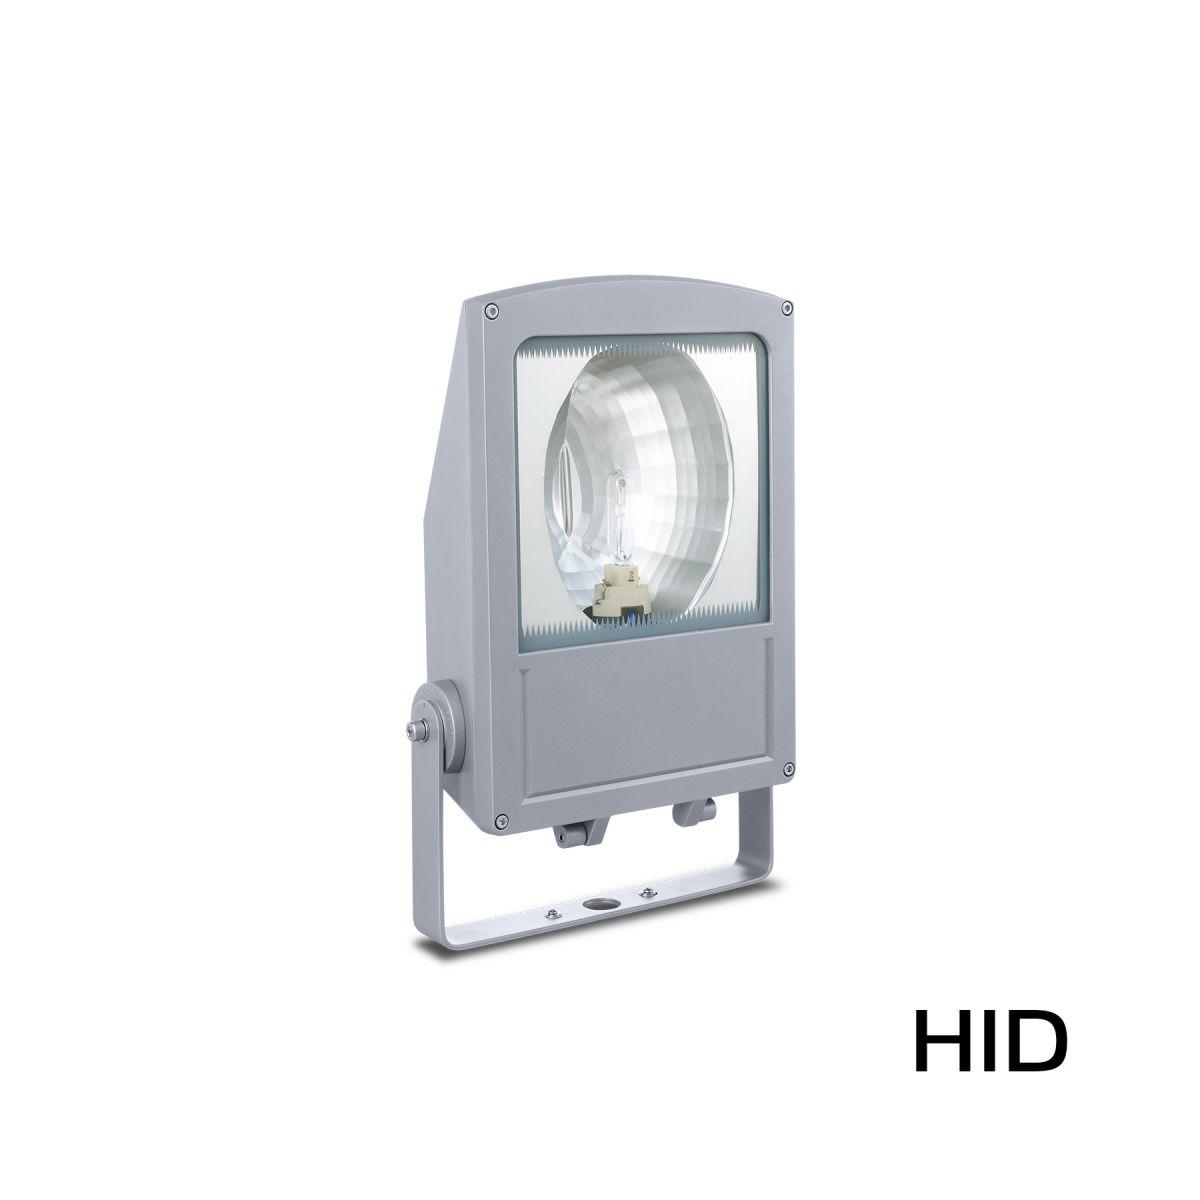 Small SIROCCO - Flood Light / Road Optic